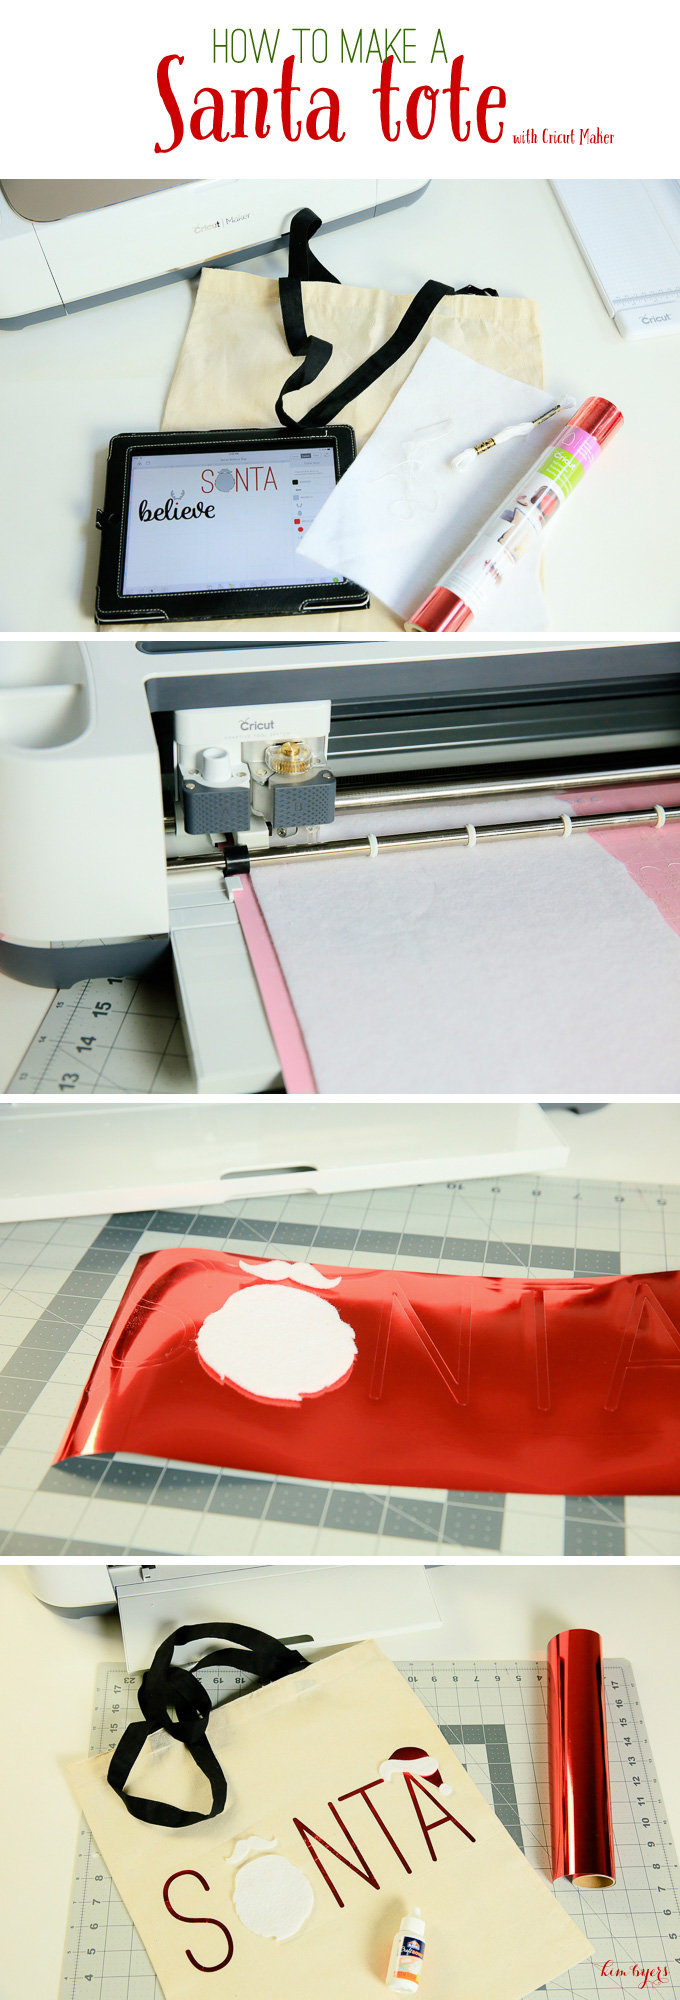 Make A Santa Bag WIth Cricut Maker   Kim Byers